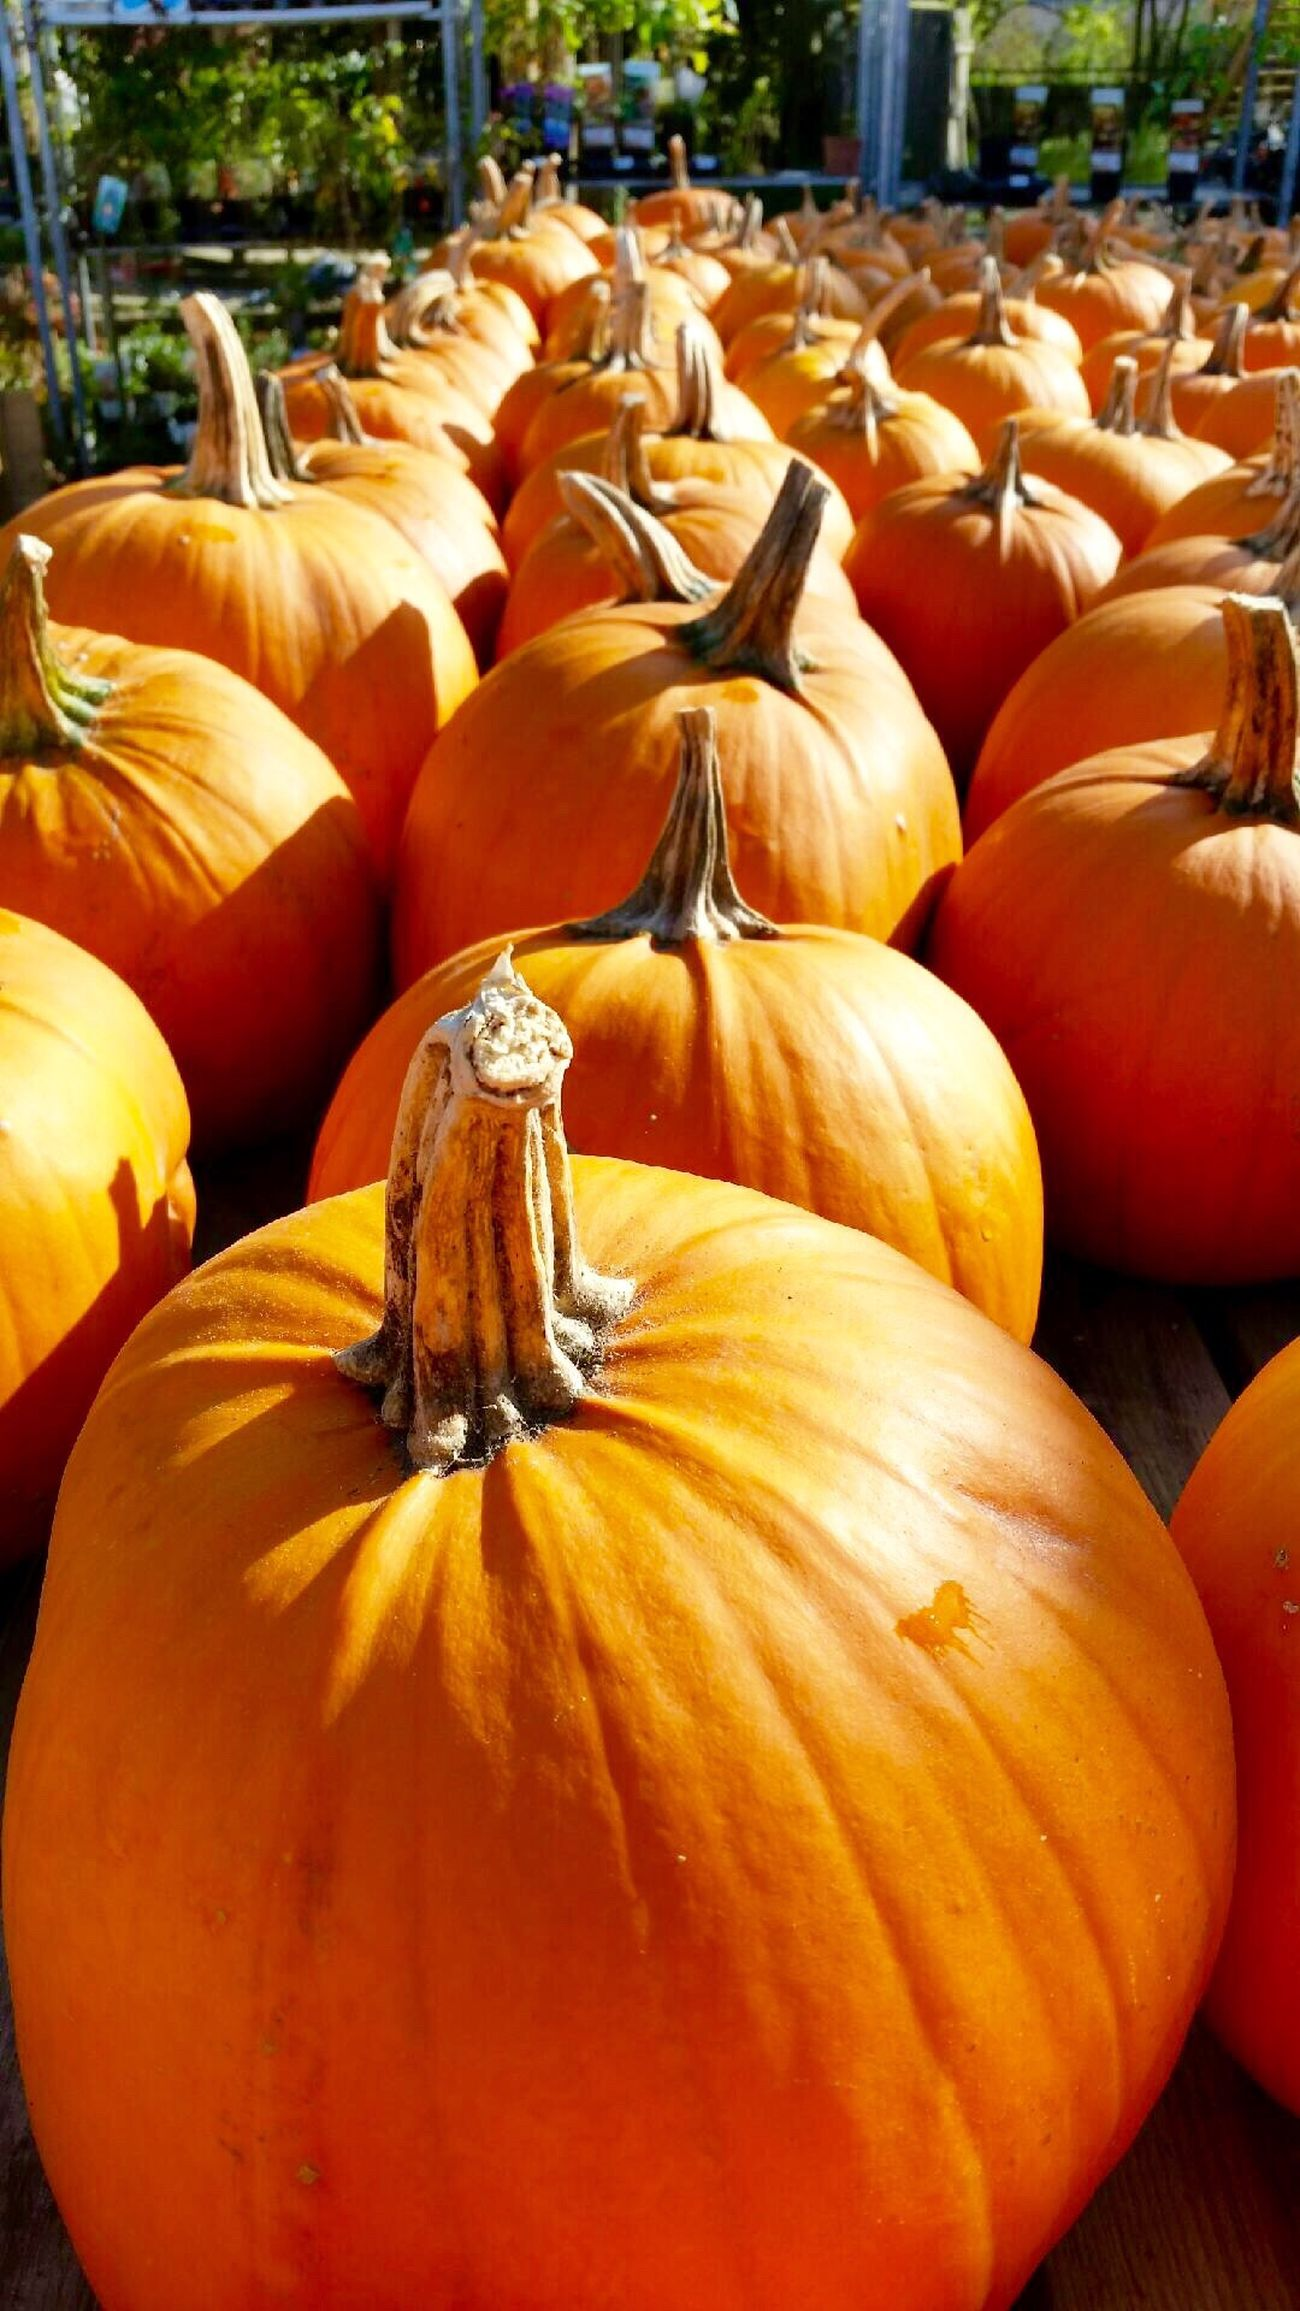 Pumpkins Pumpkin Halloween EyeEm Gallery EyeEm Best Edits EyeEmBestPics Eye4photography  Eye4delight Colors Autumn Fall